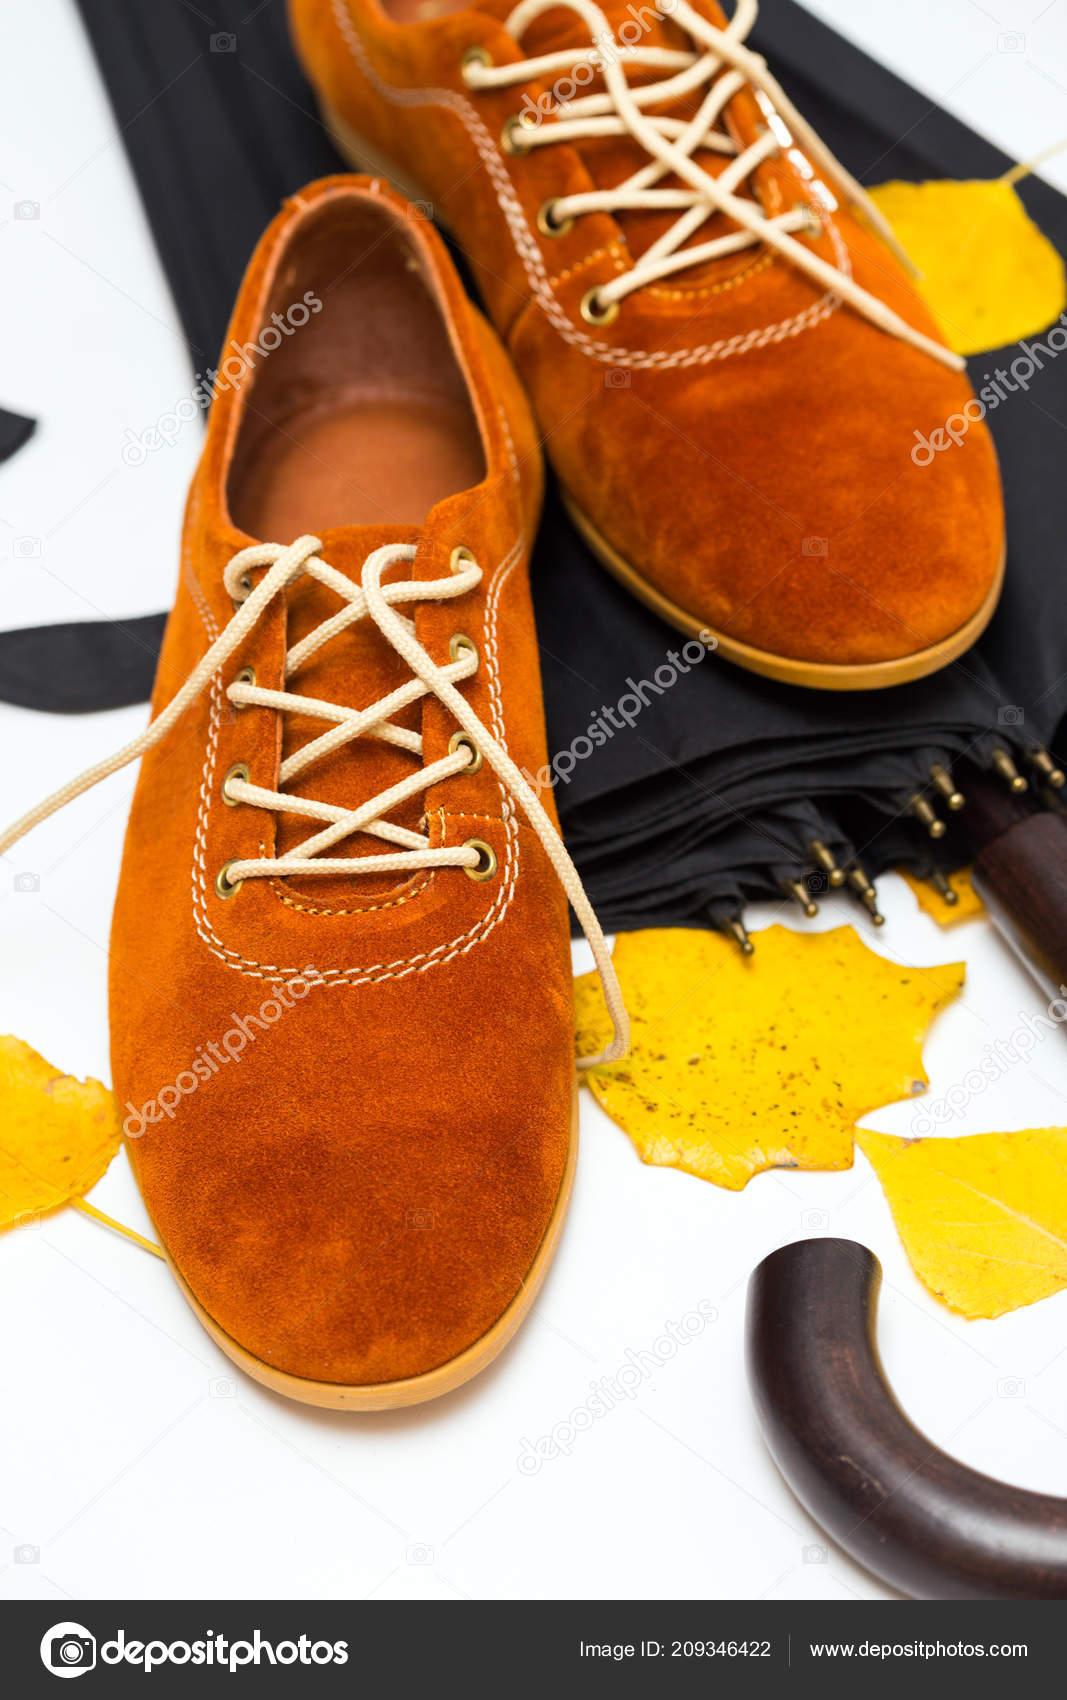 9a5d2962a309 Όμορφα Γυναικεία Παπούτσια Της Κορδόνια Ένα Λευκό Φόντο Και Φθινόπωρο —  Φωτογραφία Αρχείου